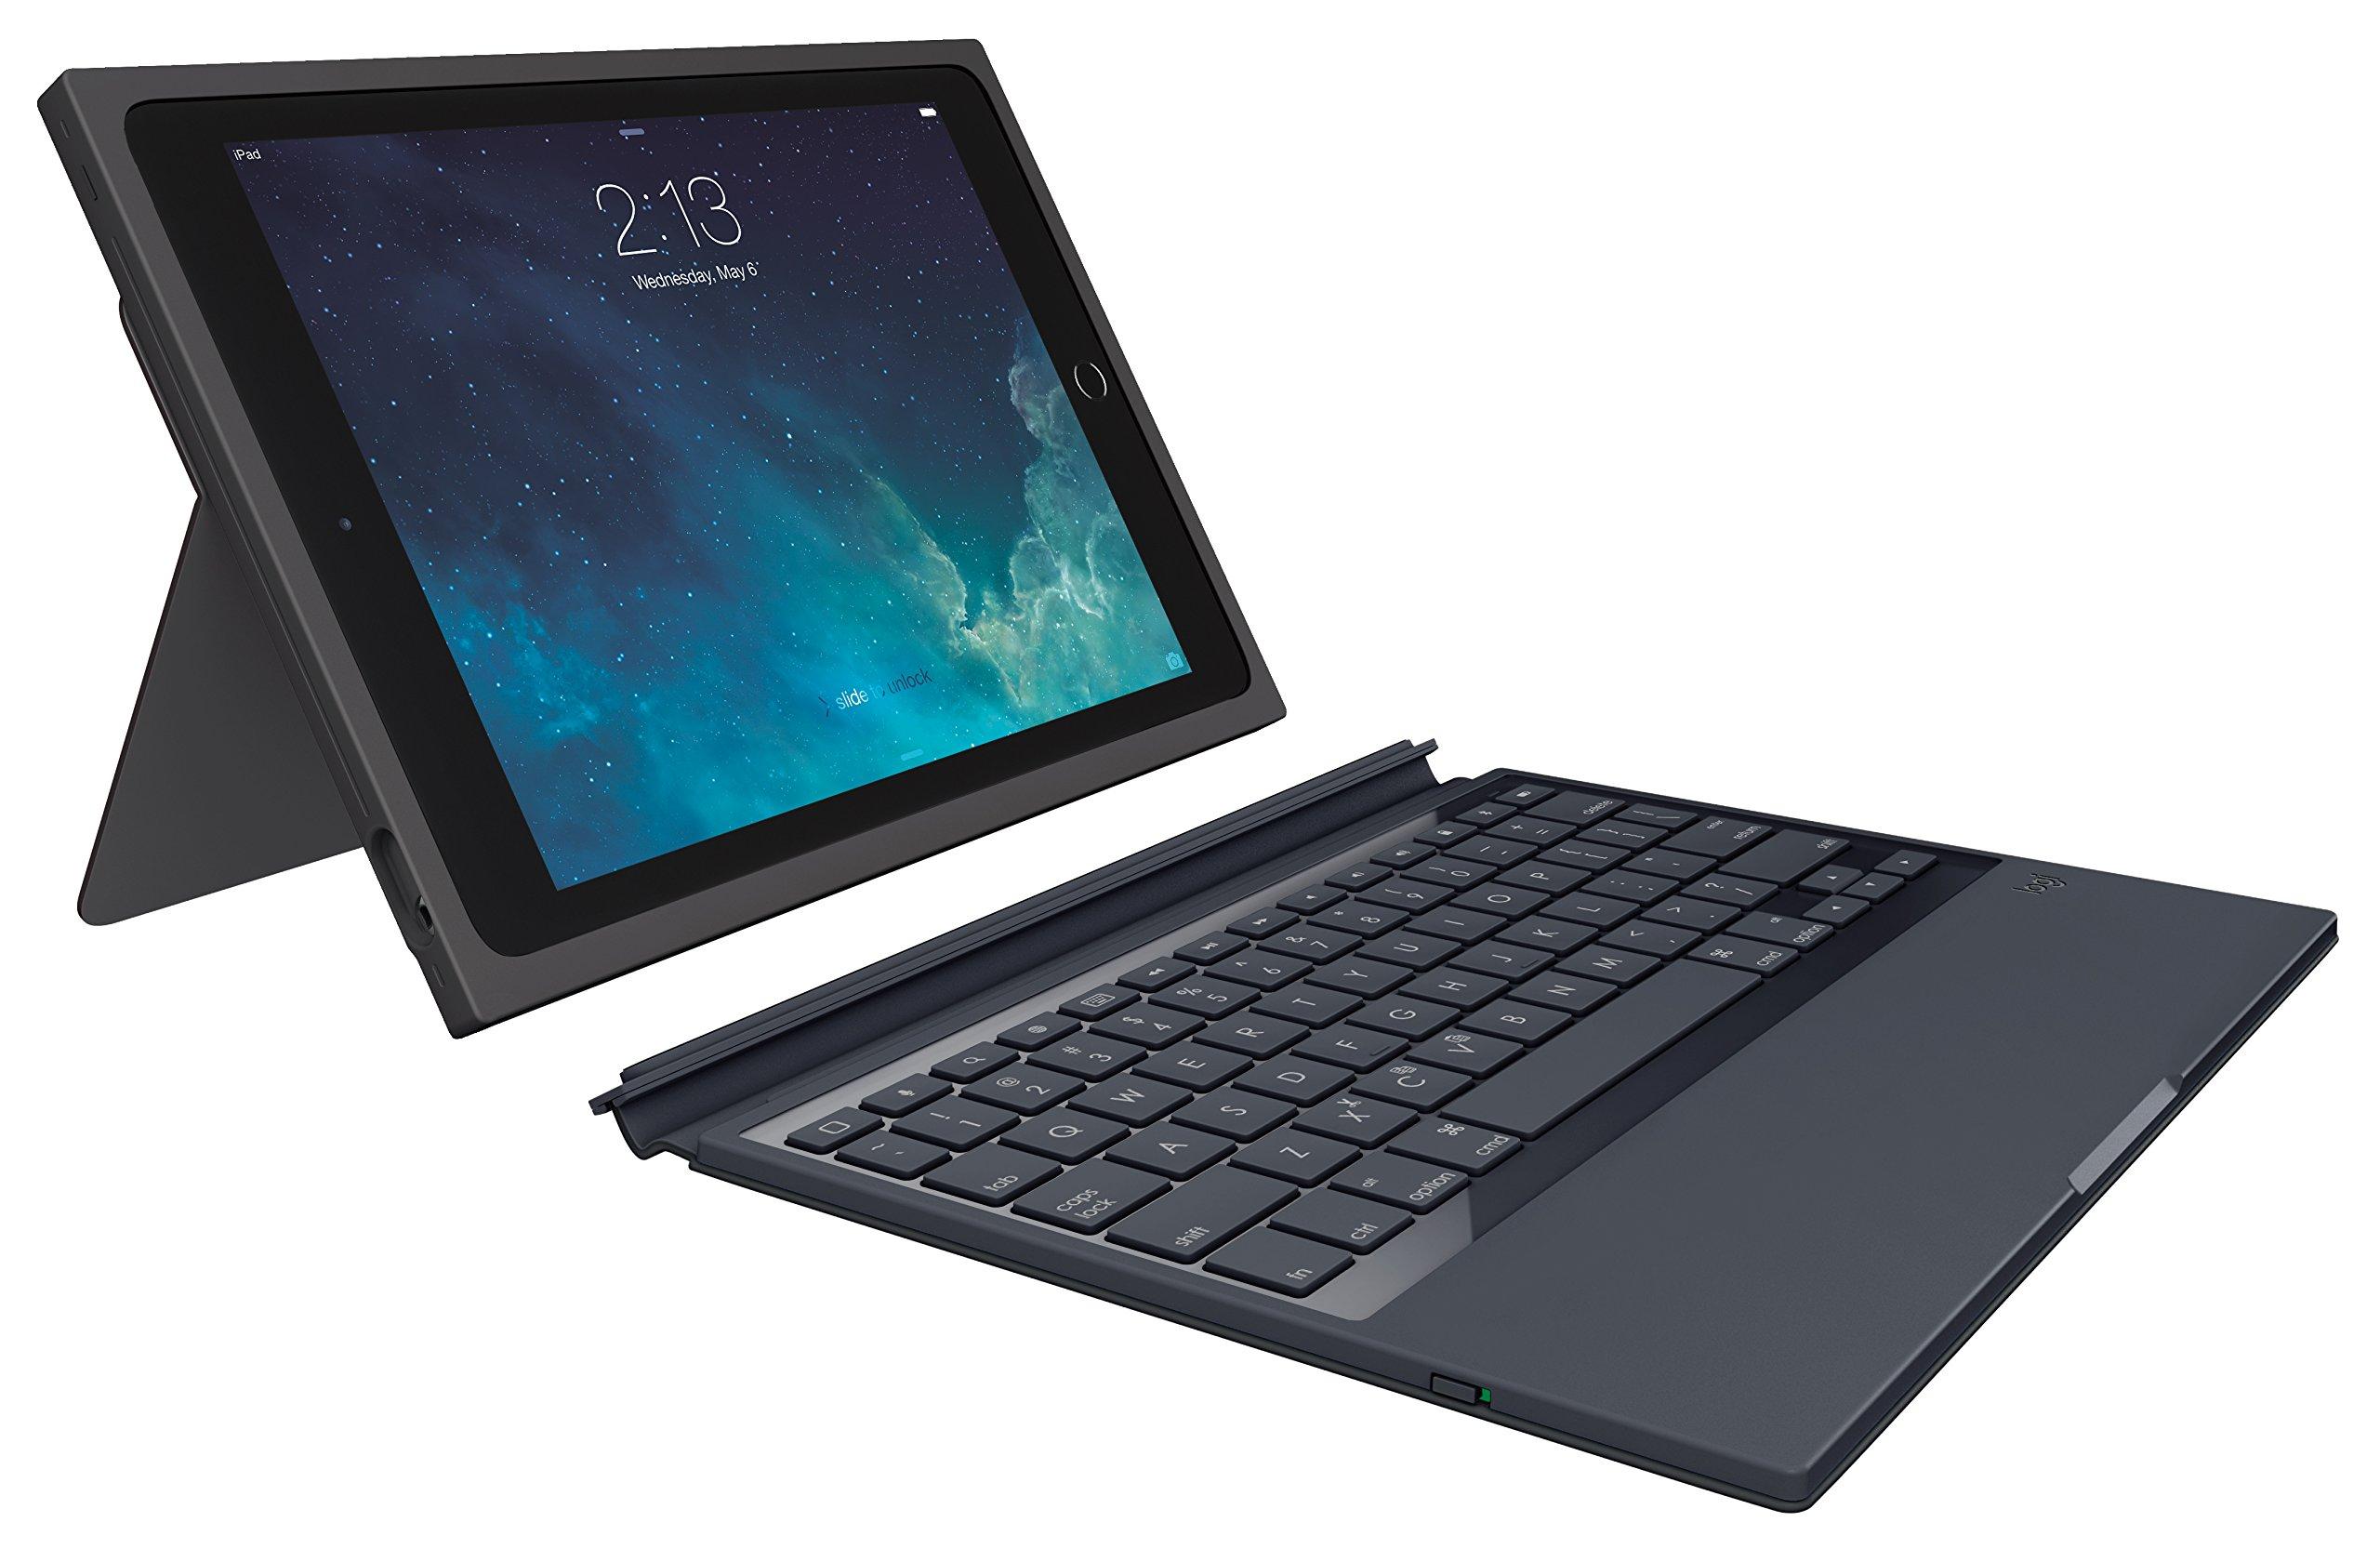 Logitech 920-007417 Blok Protective Keyboard Case for iPad Air 2, Black